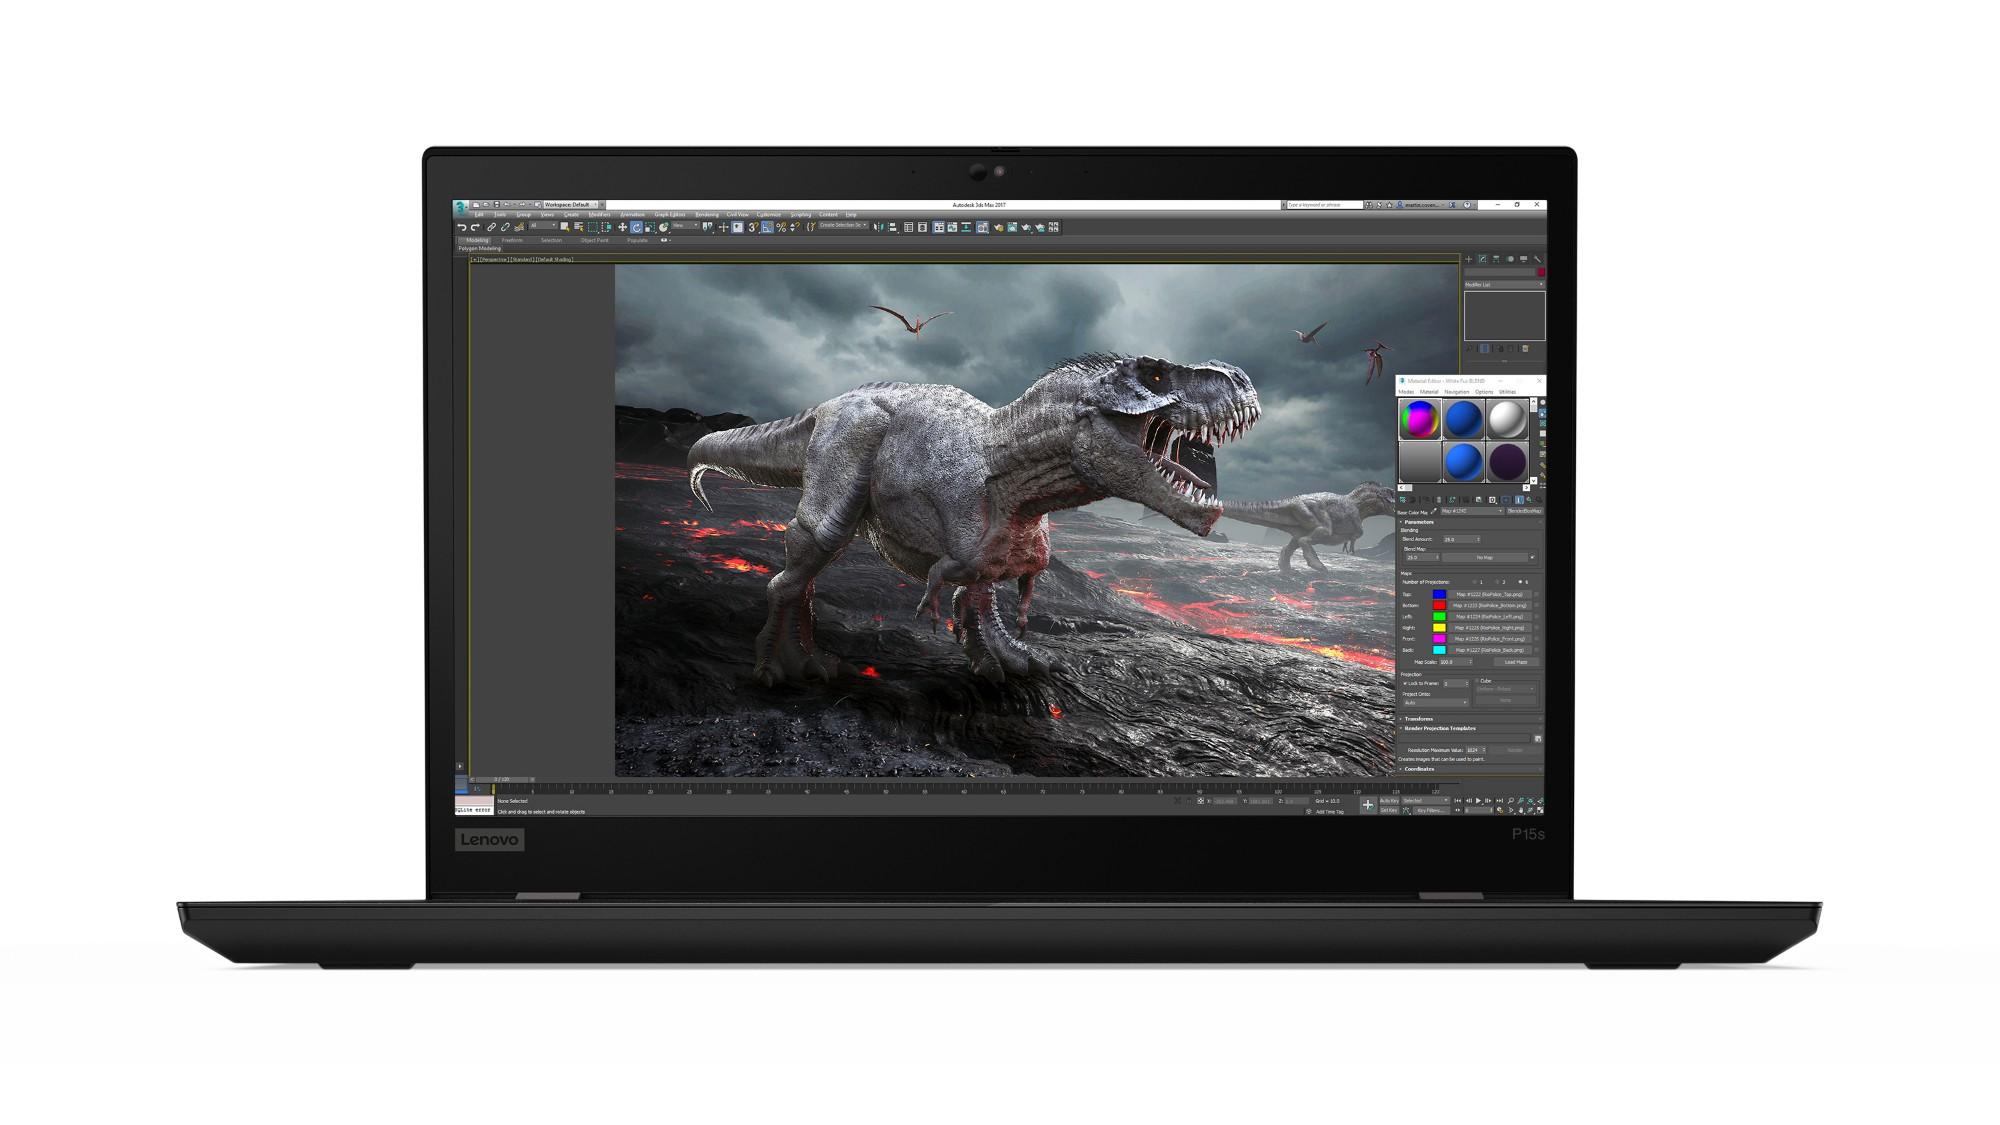 Lenovo ThinkPad P15s Mobile workstation Black 39.6 cm (15.6